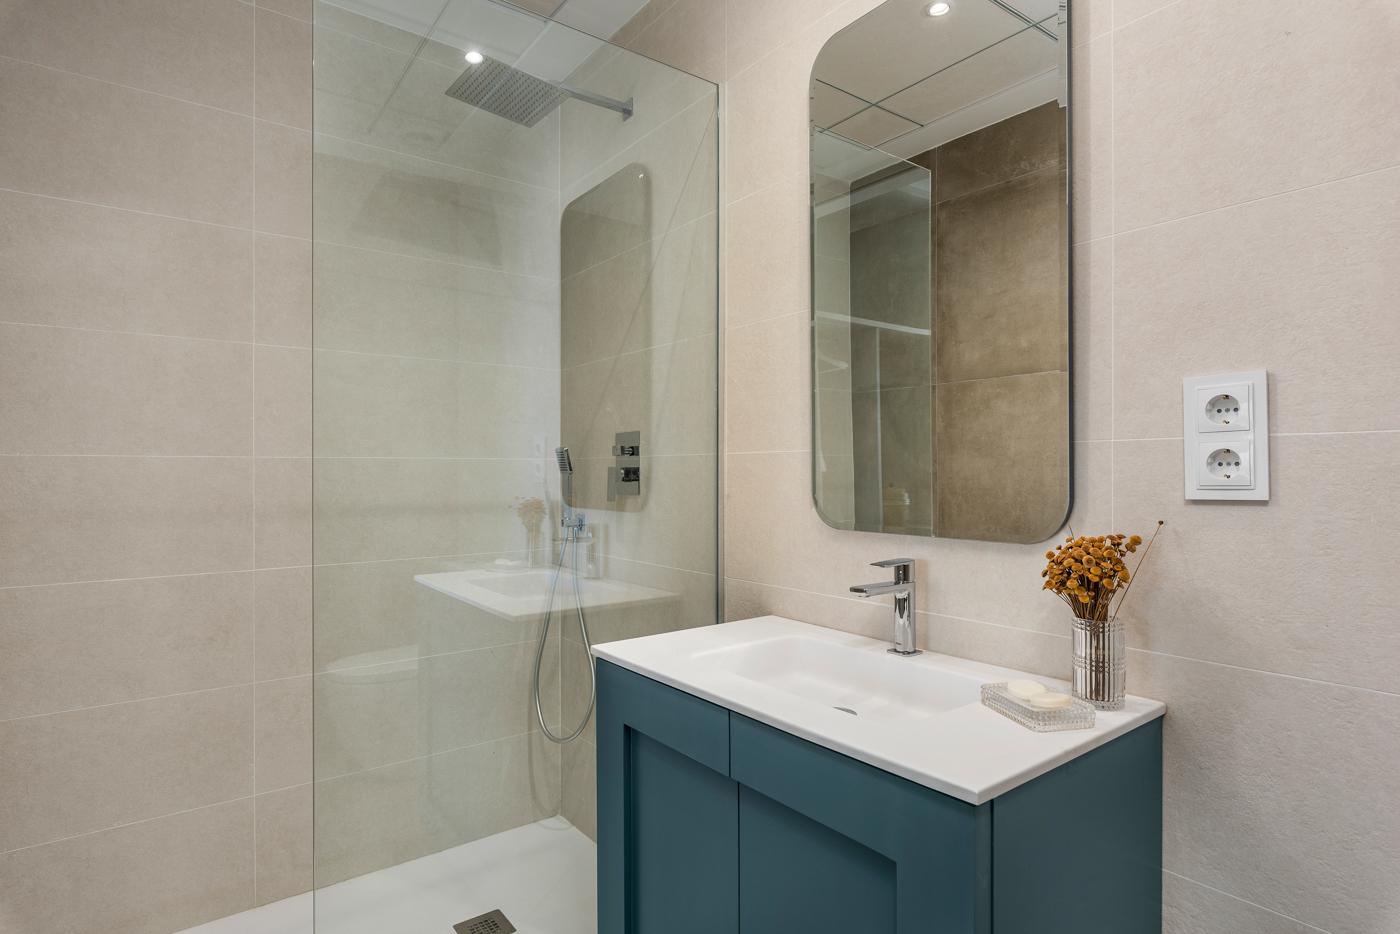 34 - Paris V - 1st Room Bathroom